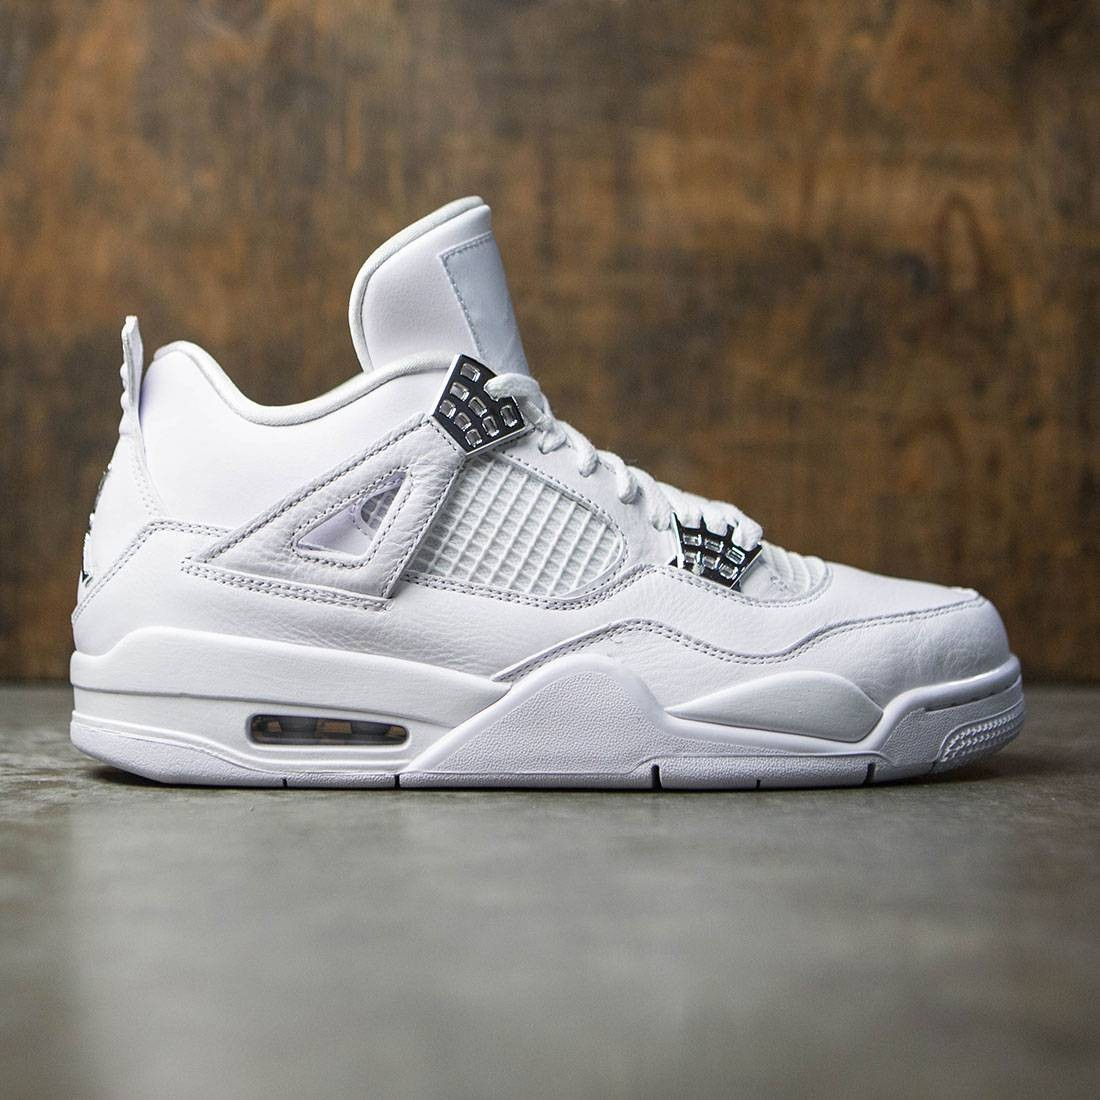 White Retro: Jordan Men Air Jordan 4 Retro White Metallic Silver Pure